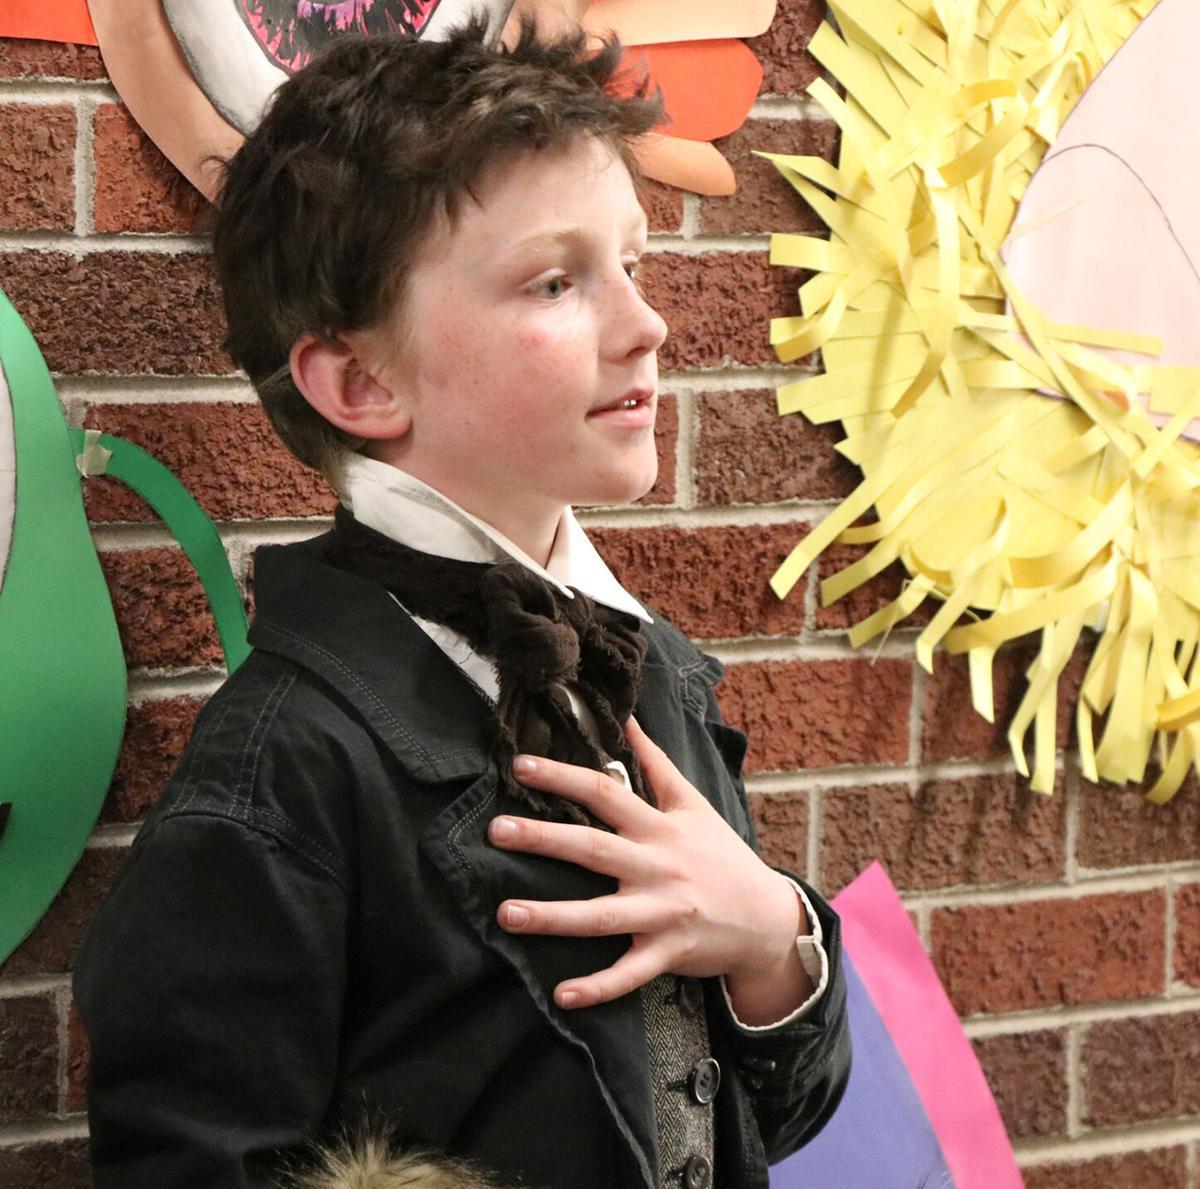 Famous Nebraskans portrayed by elementary students